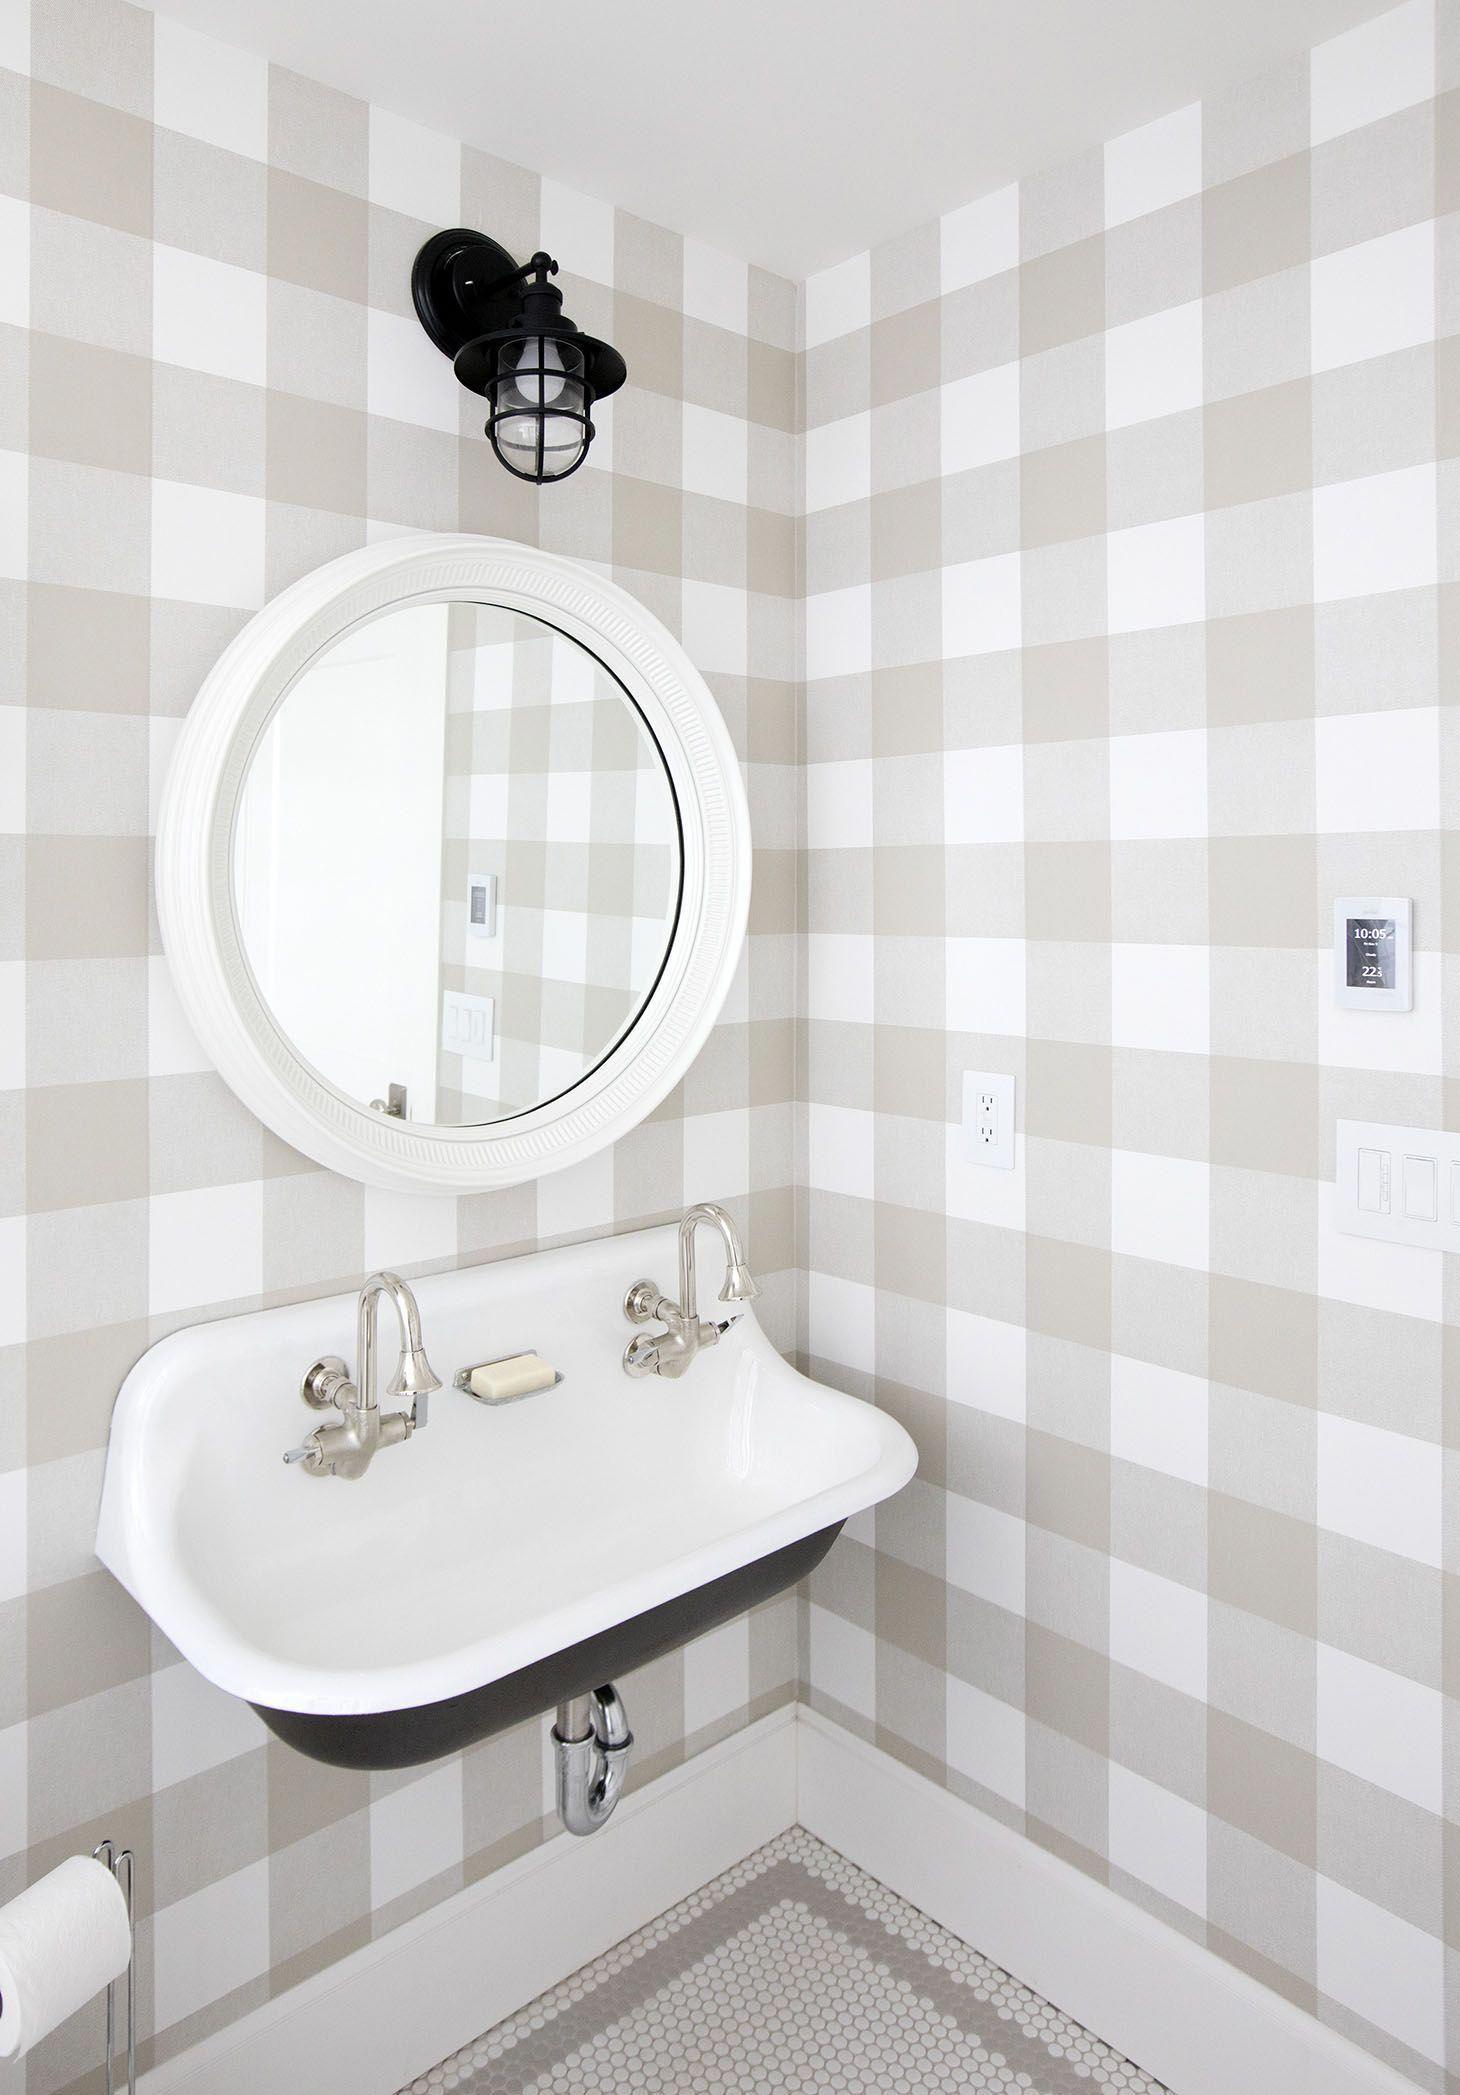 Home Tour Series Spare Bathroom in 2020 Bathroom